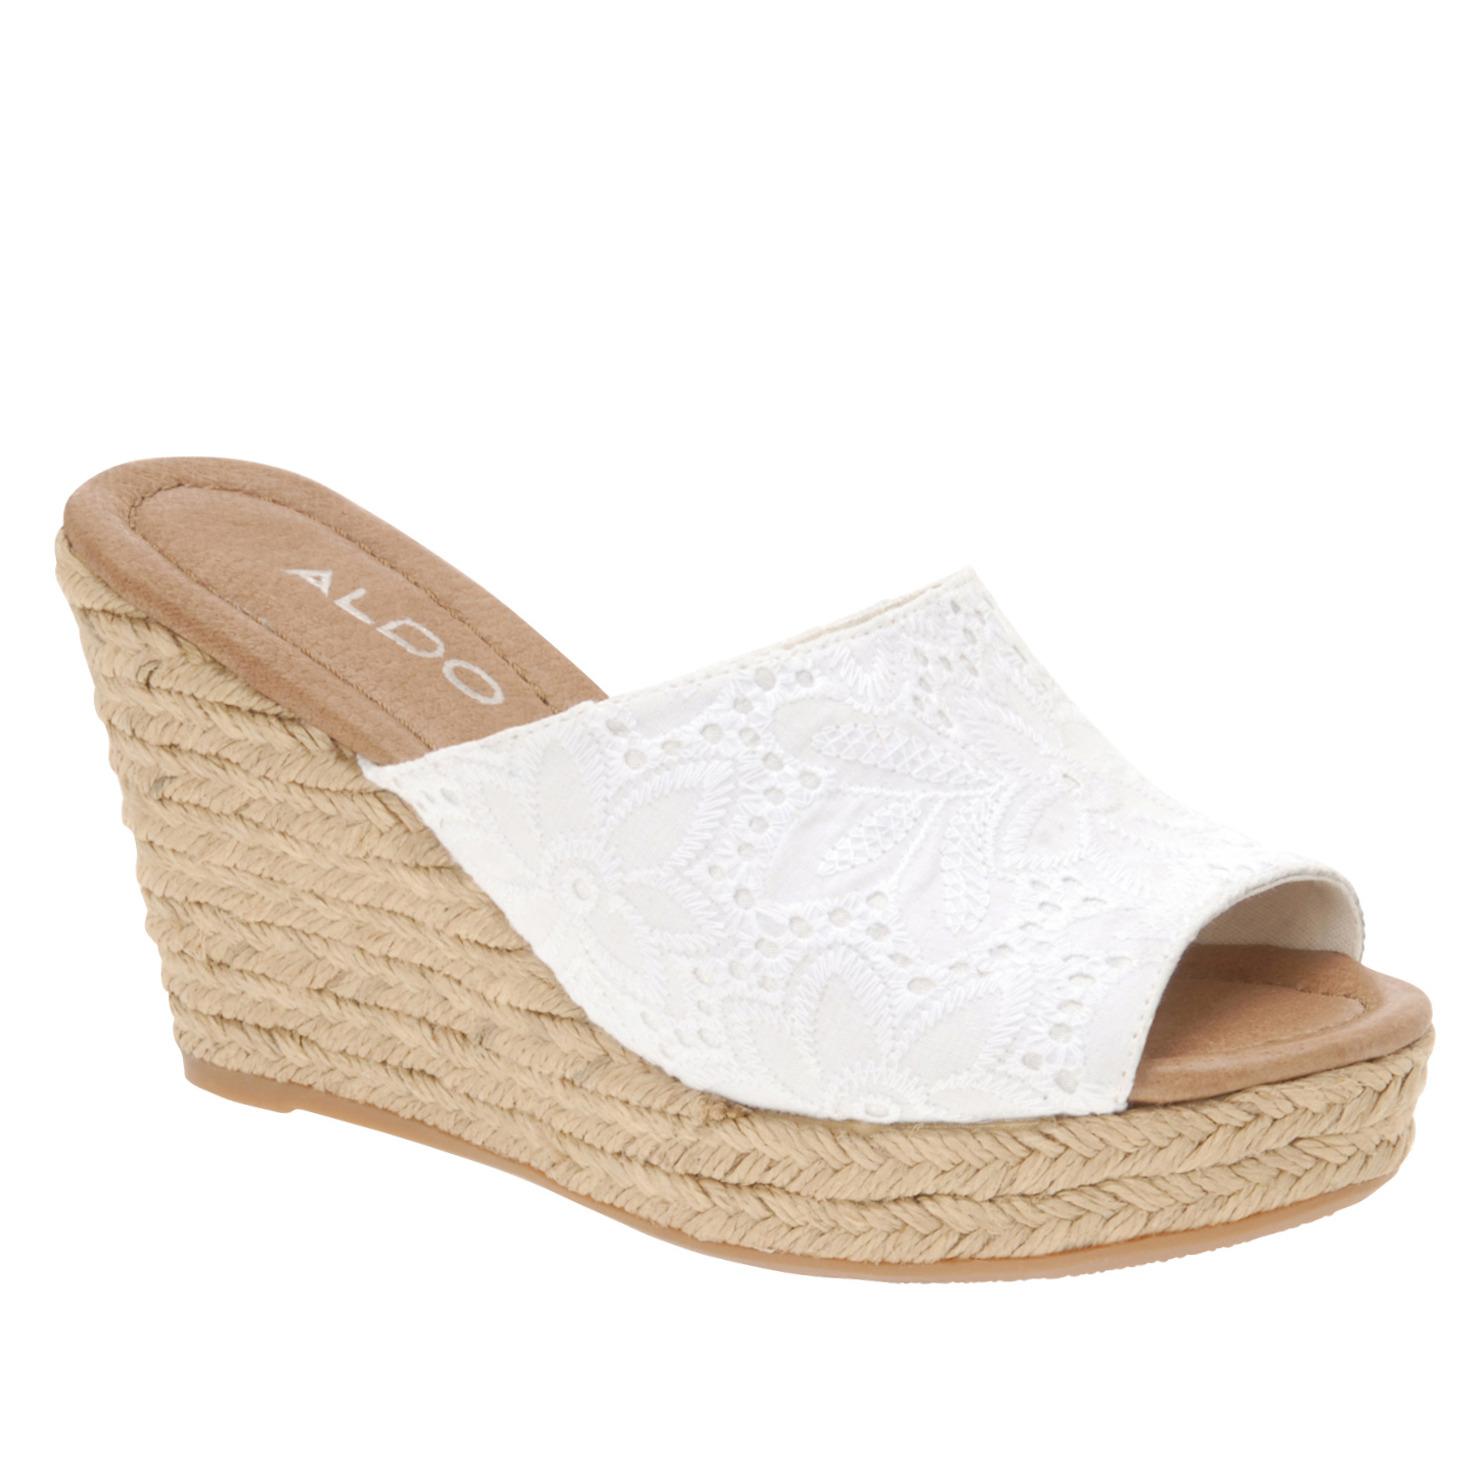 b6b0139cf58 Lyst - ALDO Wedge Sandals in White